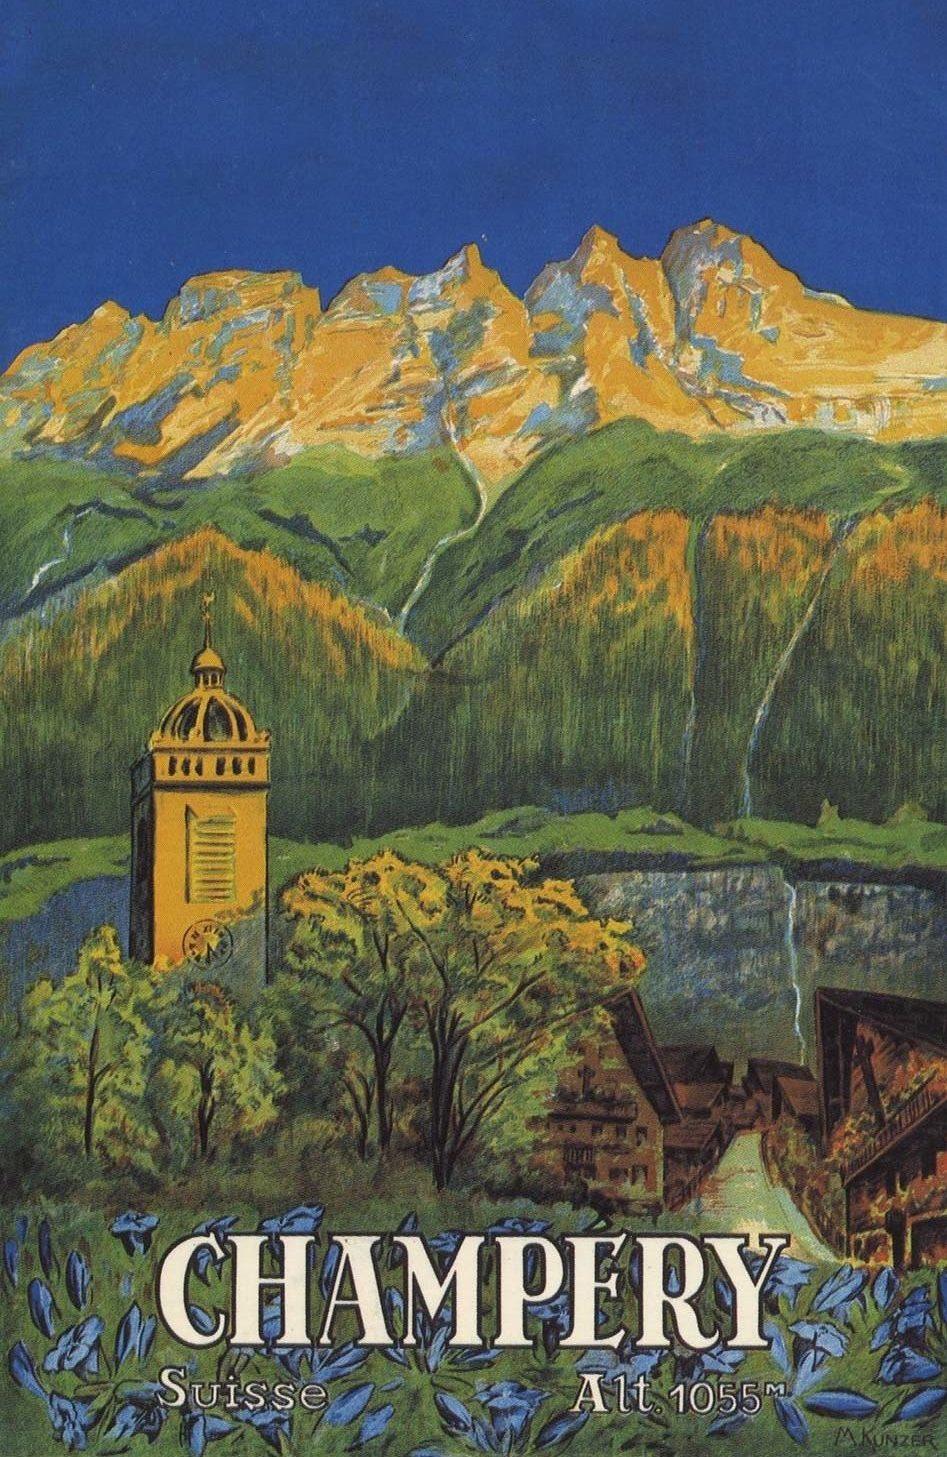 Affiche pour l'Office du Tourisme de Champéry, 1925. © Plakatsammlung Kunstgewerbemuseum Zürich